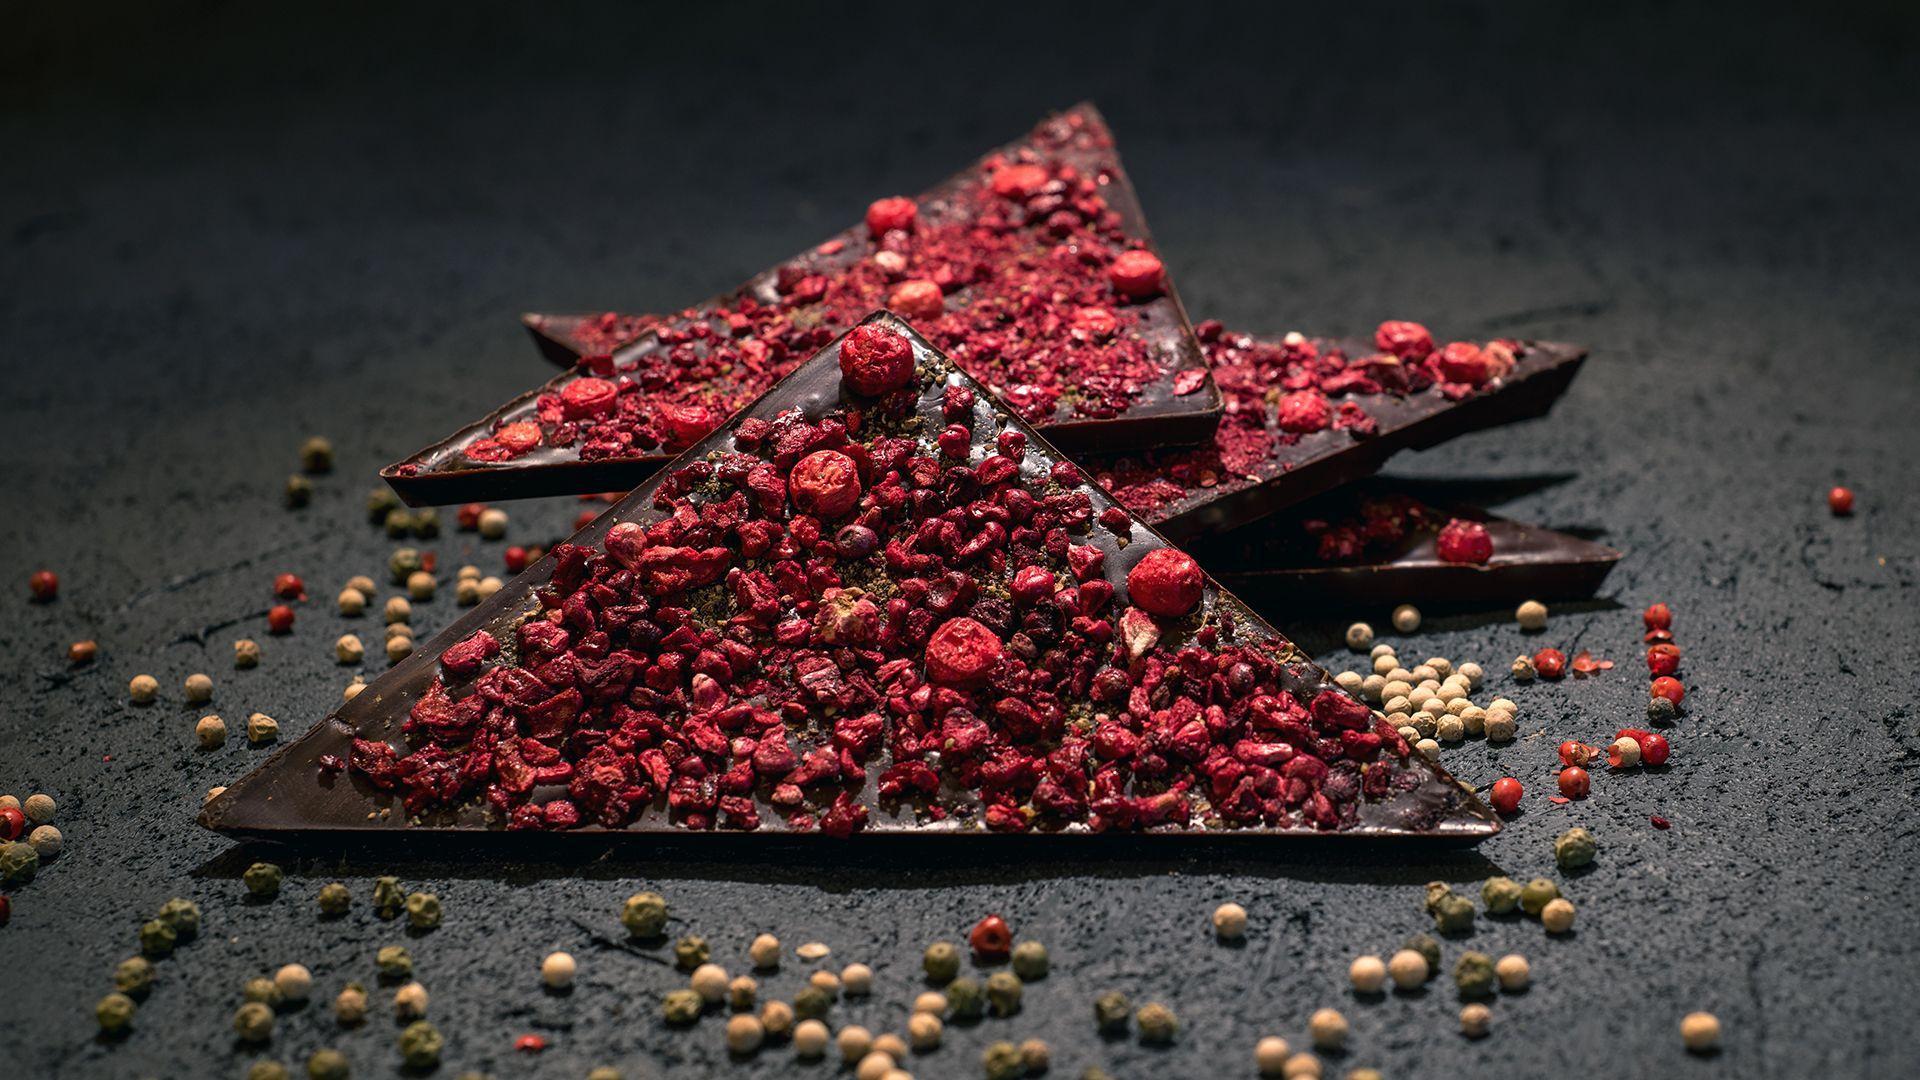 Aguara chocolate dedicated to wine Cabernet Sauvignon